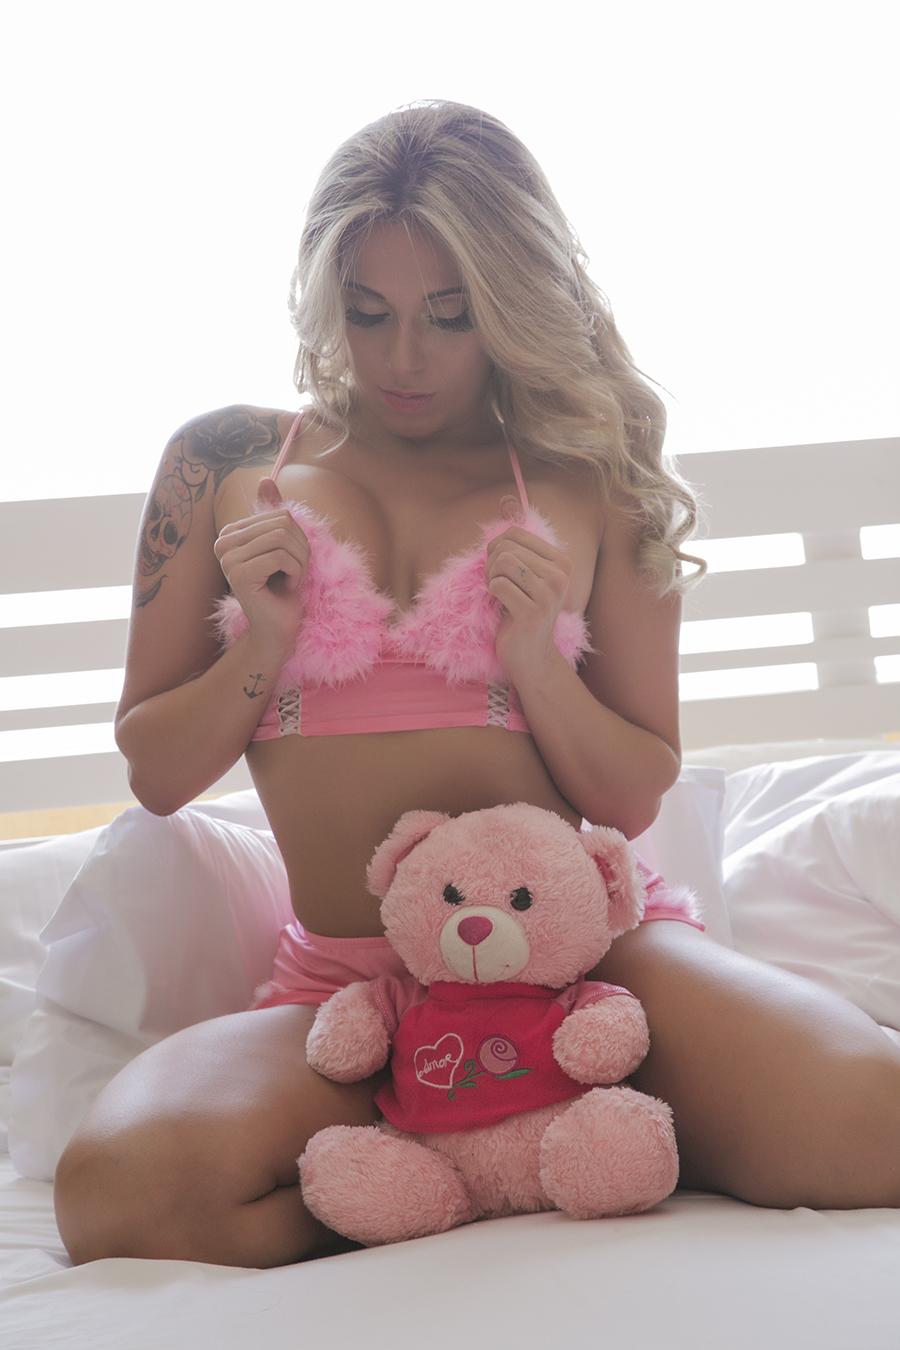 Larissa Franco